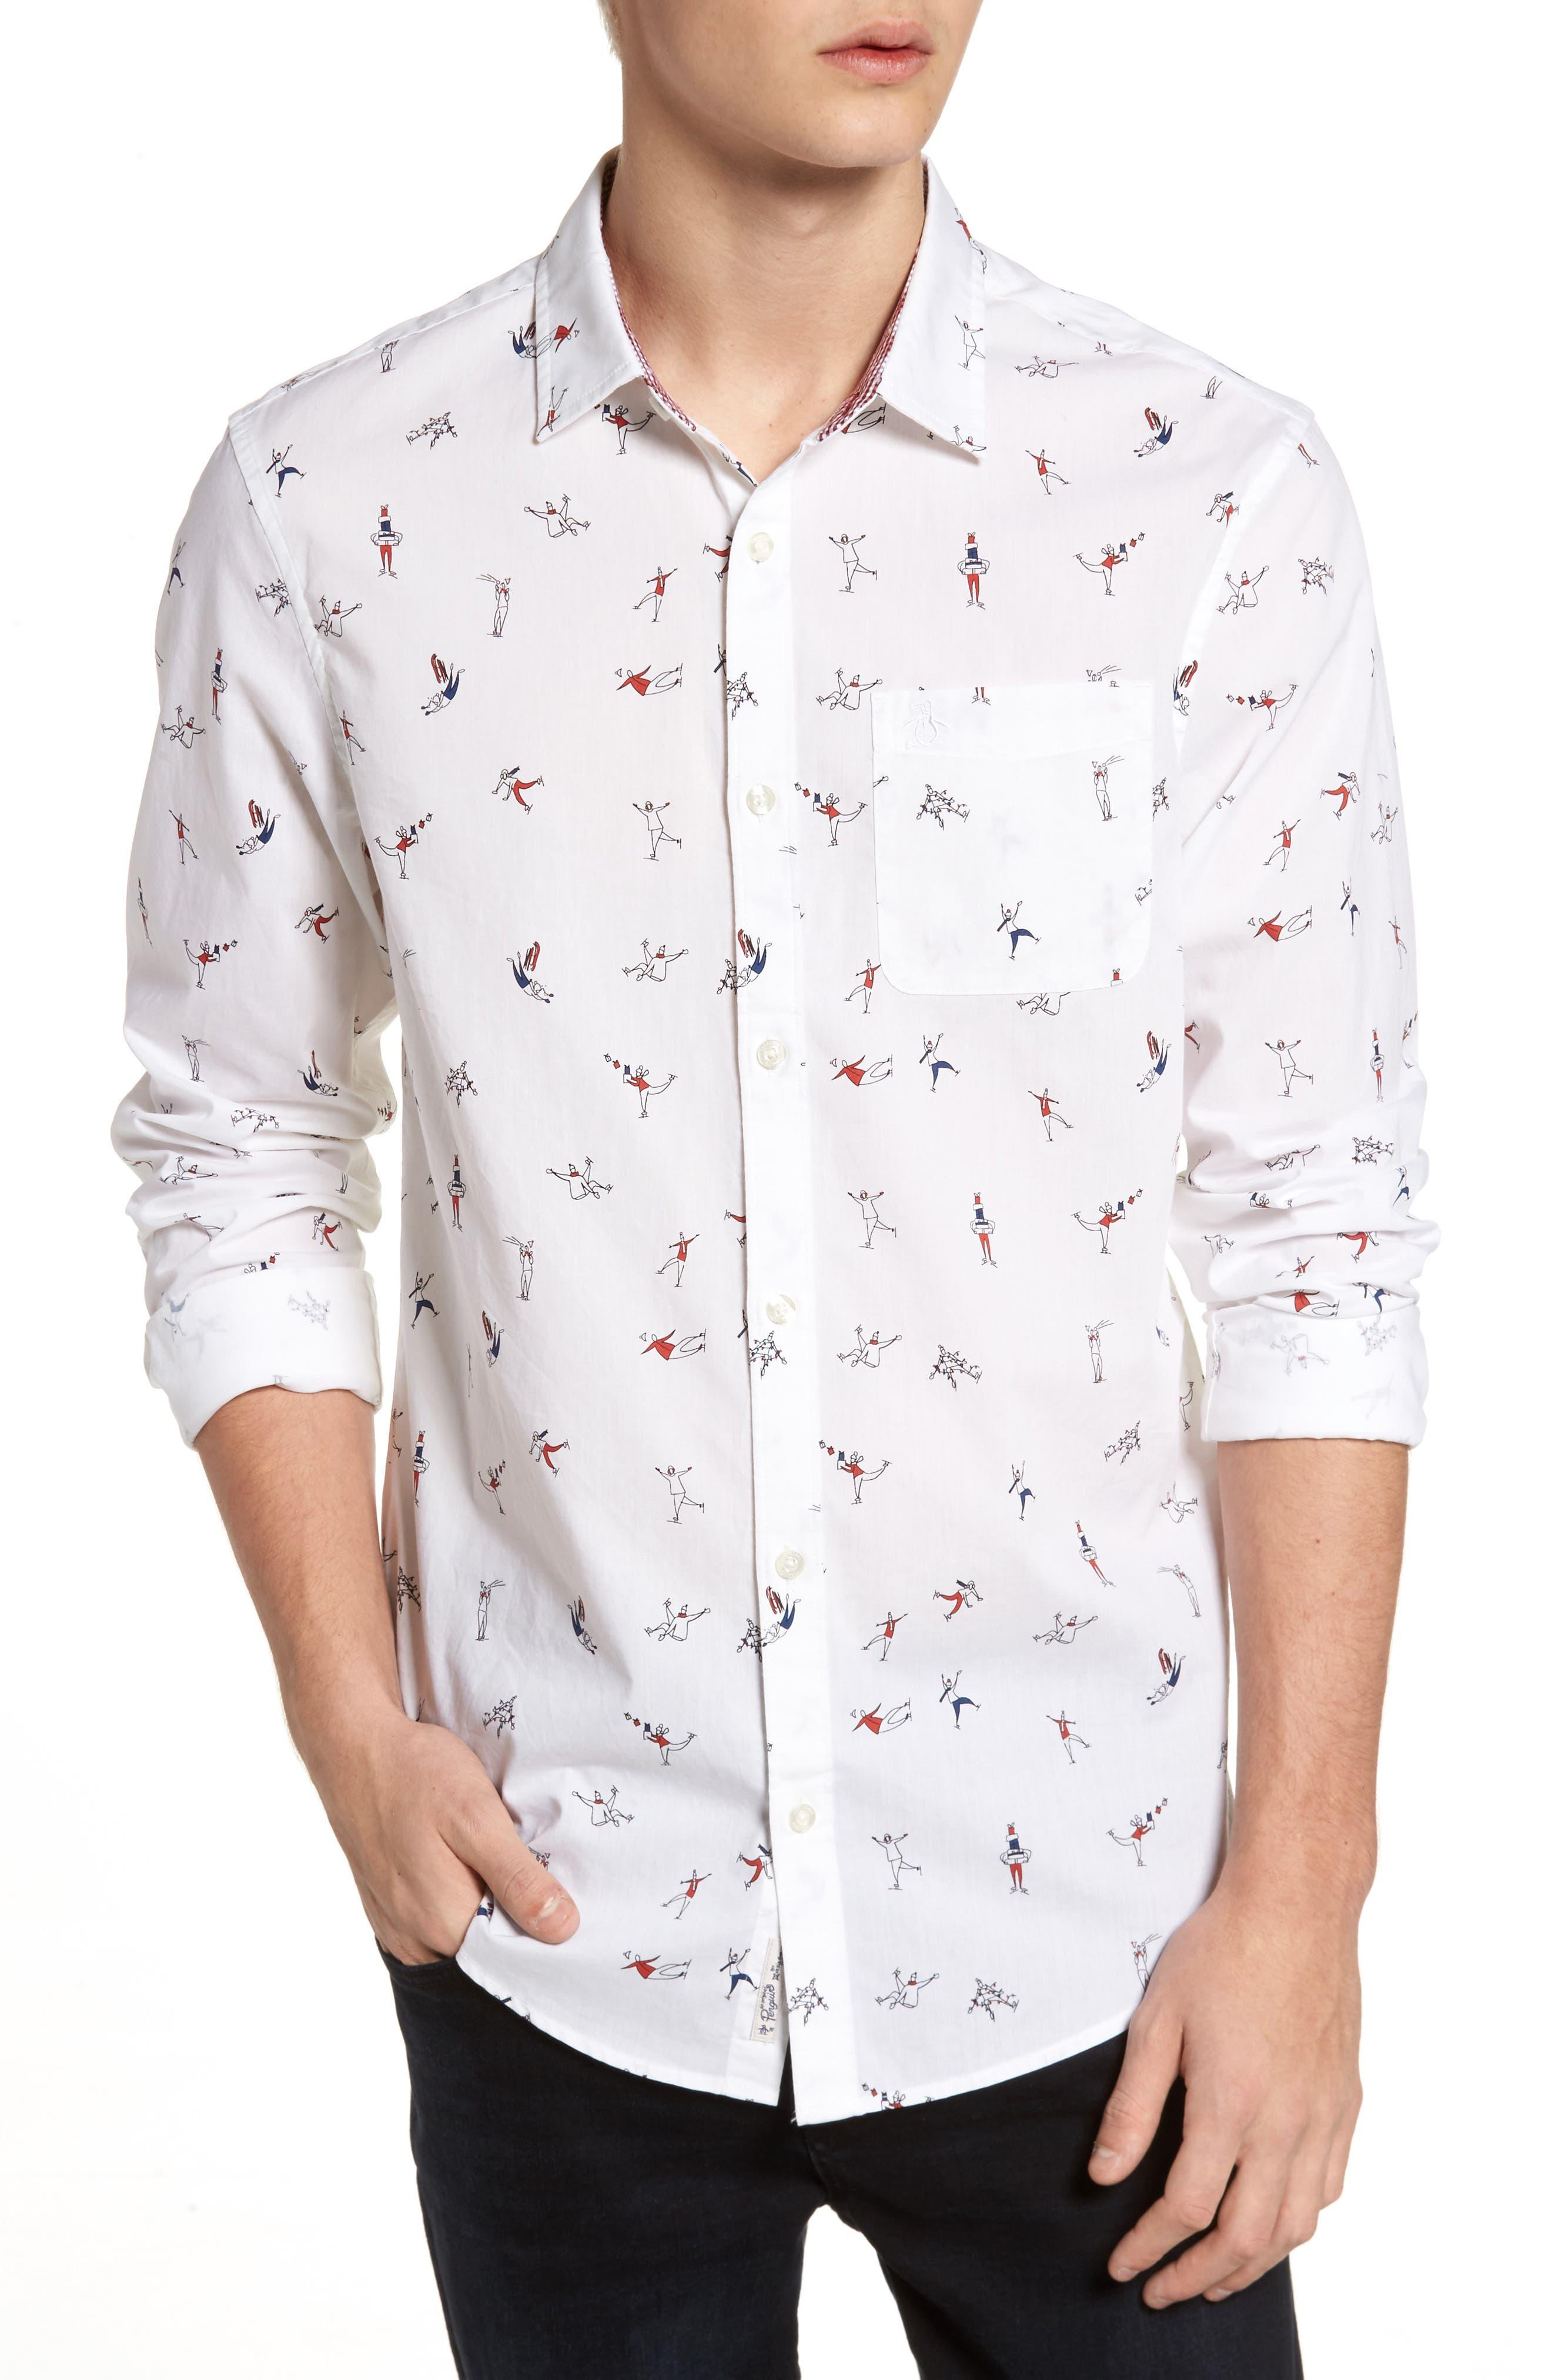 Clumsy Skaters Poplin Shirt,                         Main,                         color,